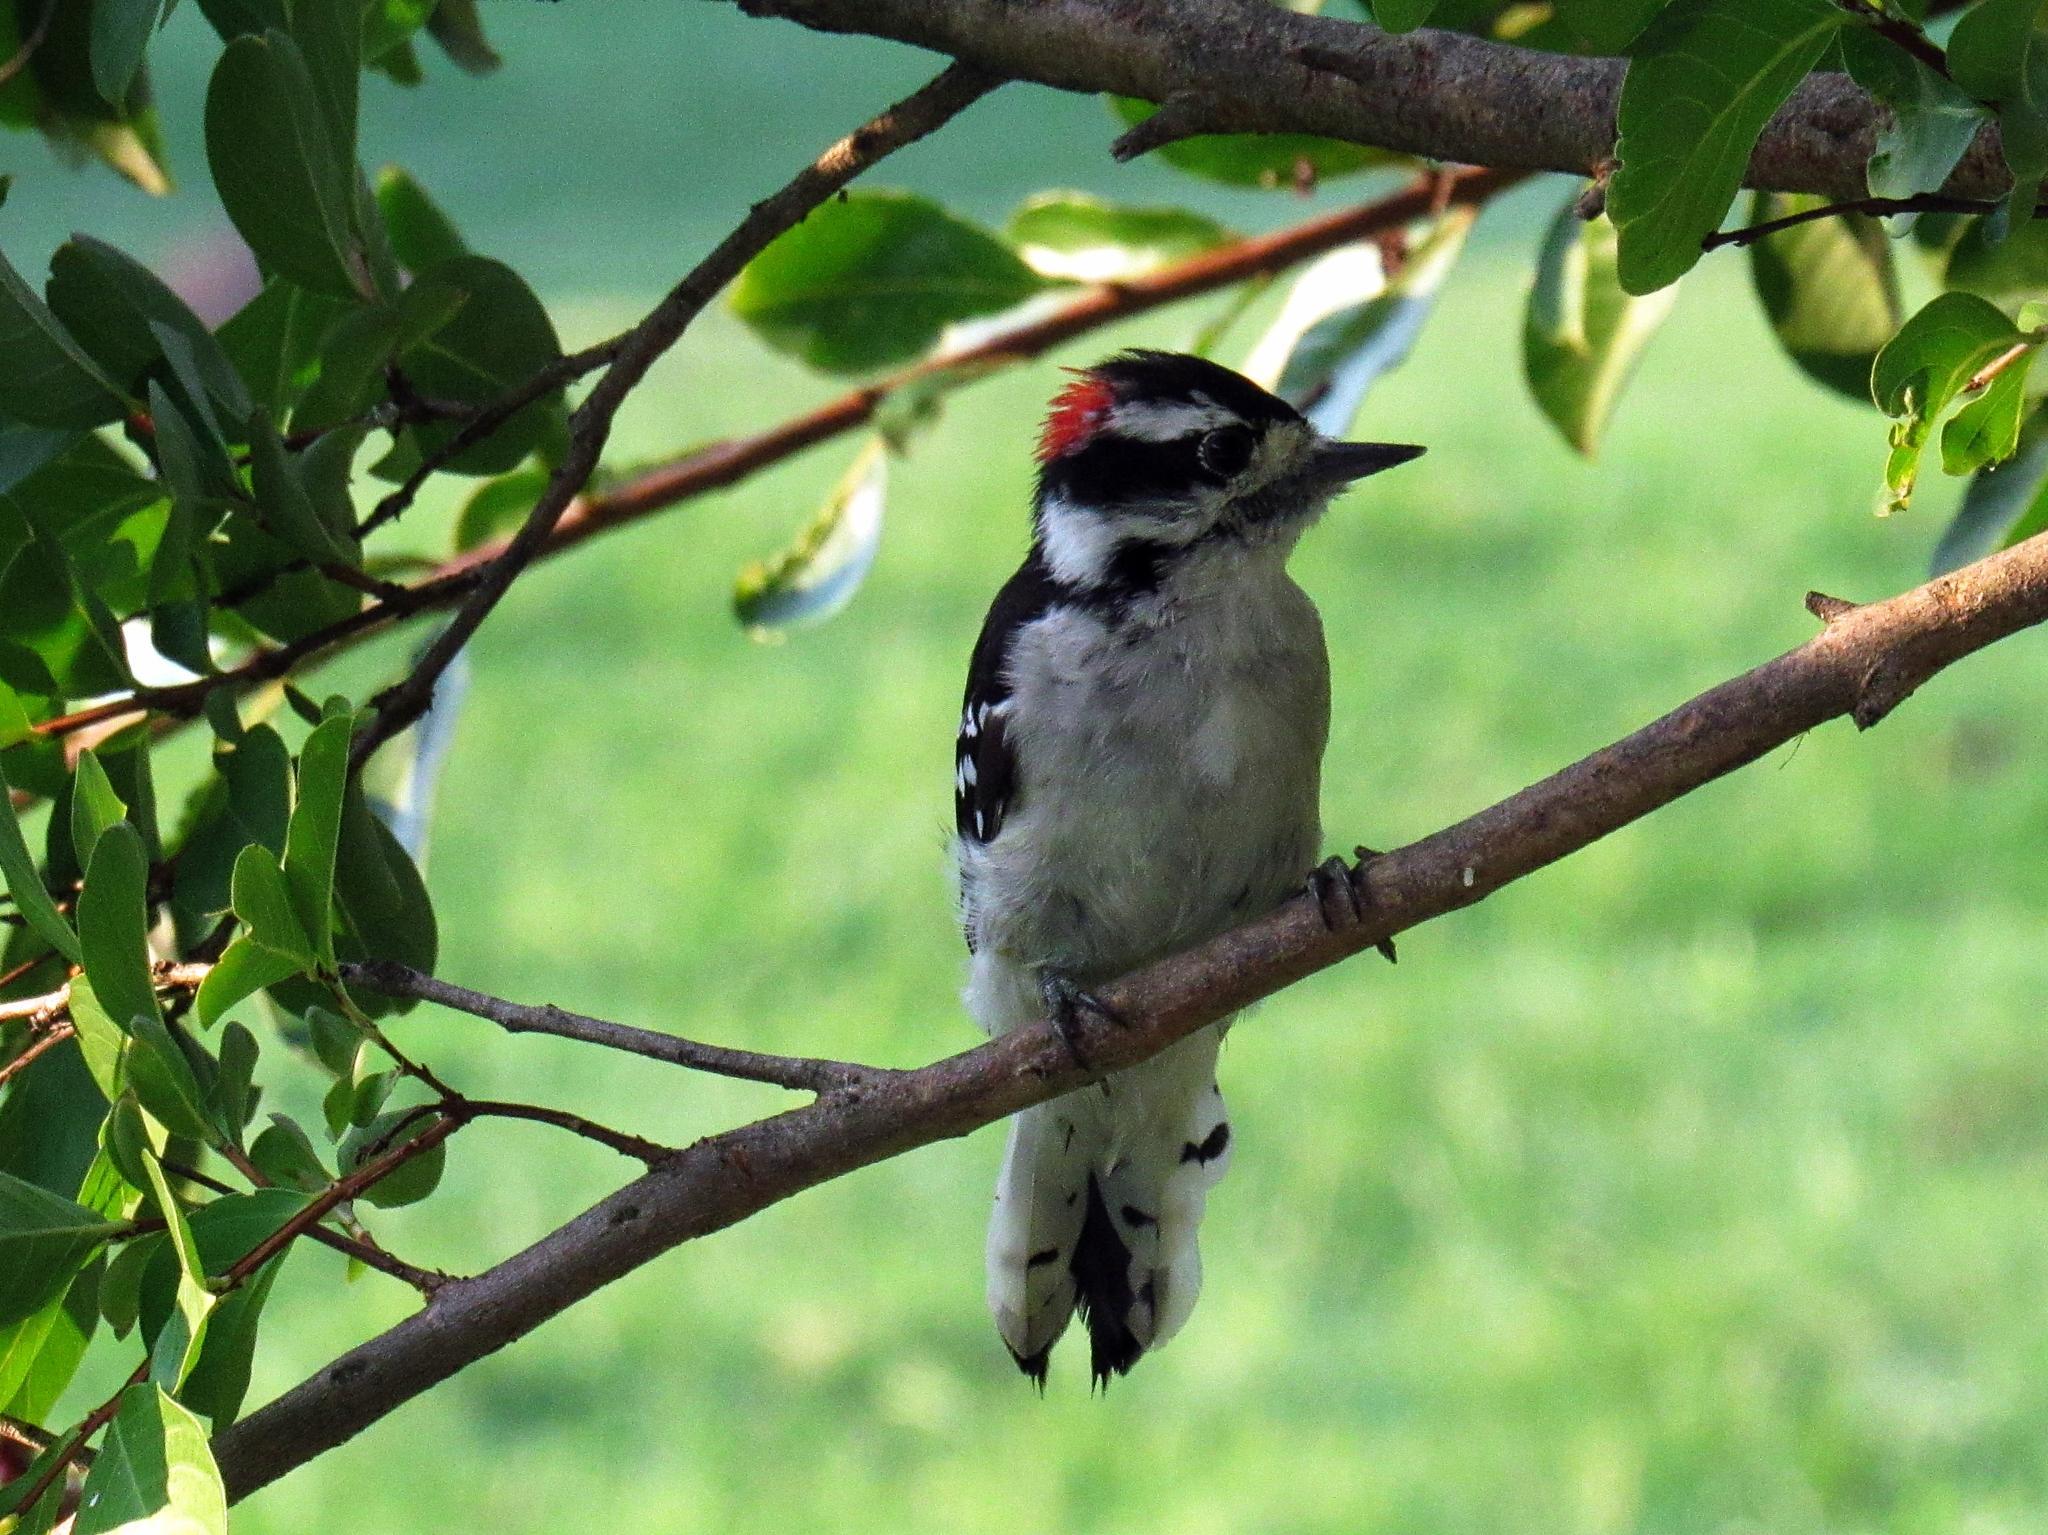 Our Male Downy Woodpecker by Catherine Wegener